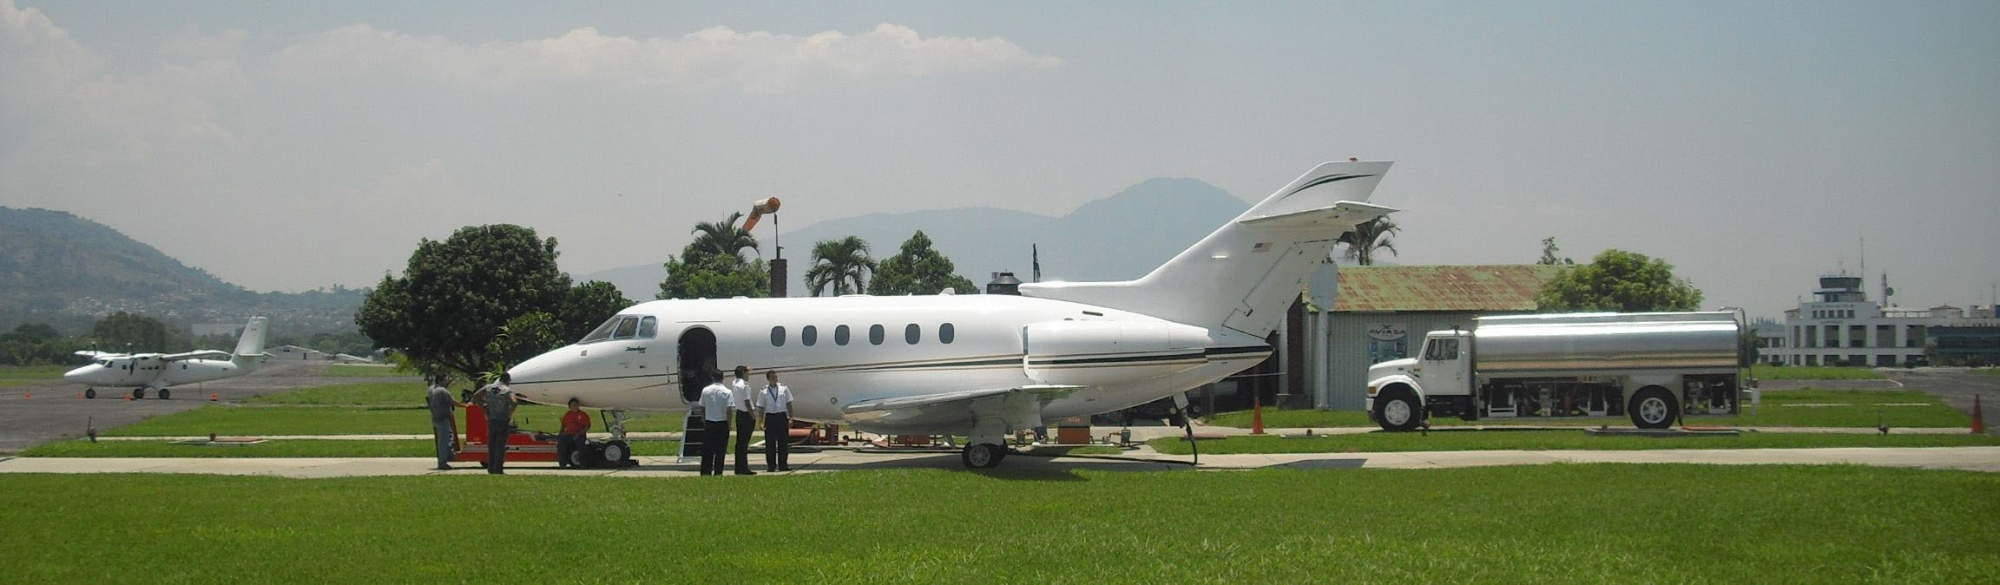 Central America FBO Jet Plane Airliner